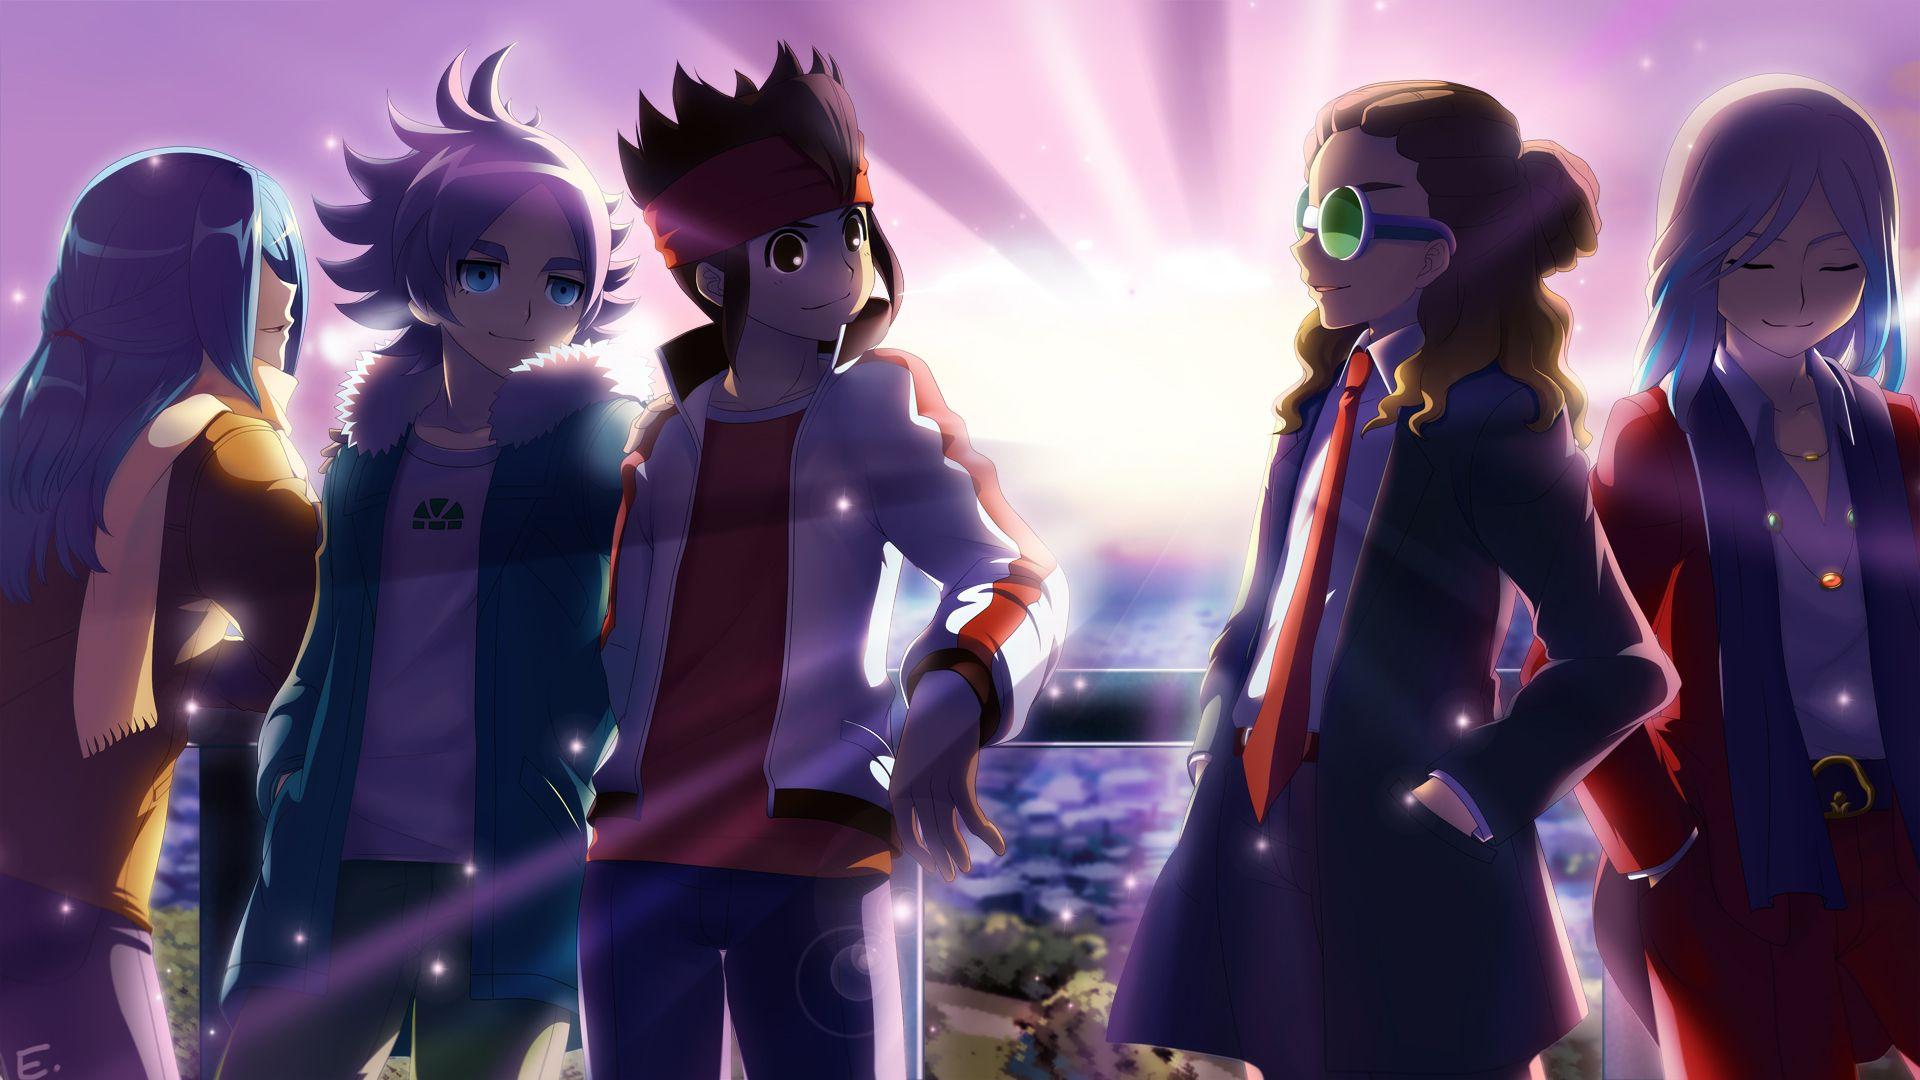 Inazuma Eleven Go 1140702 Fullsize Image 1920x1080 Zerochan Anime Eleventh Kido